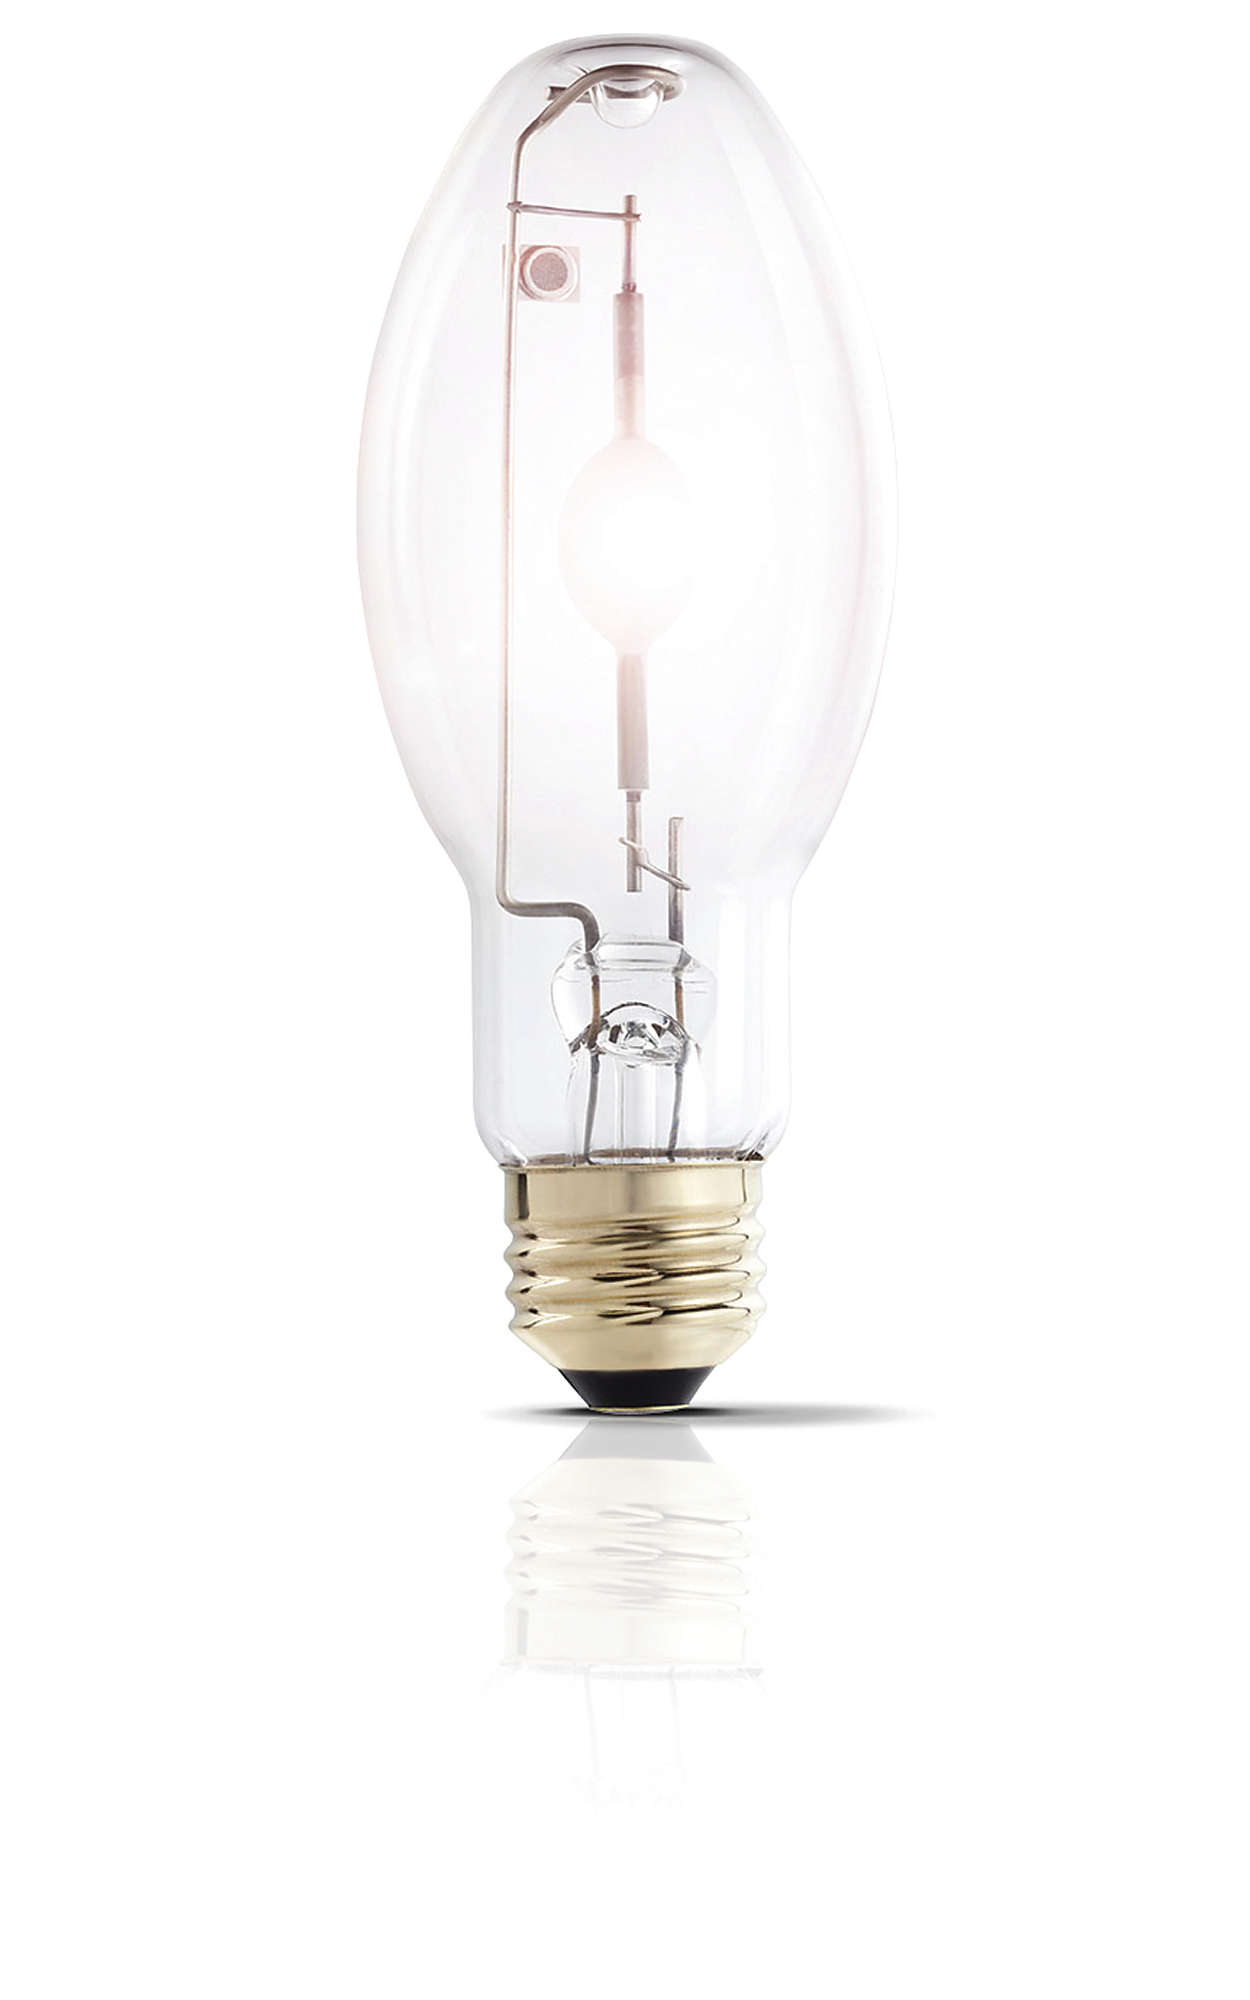 Energy Advantage CDM Lamps with AllStart Technology E-Rated